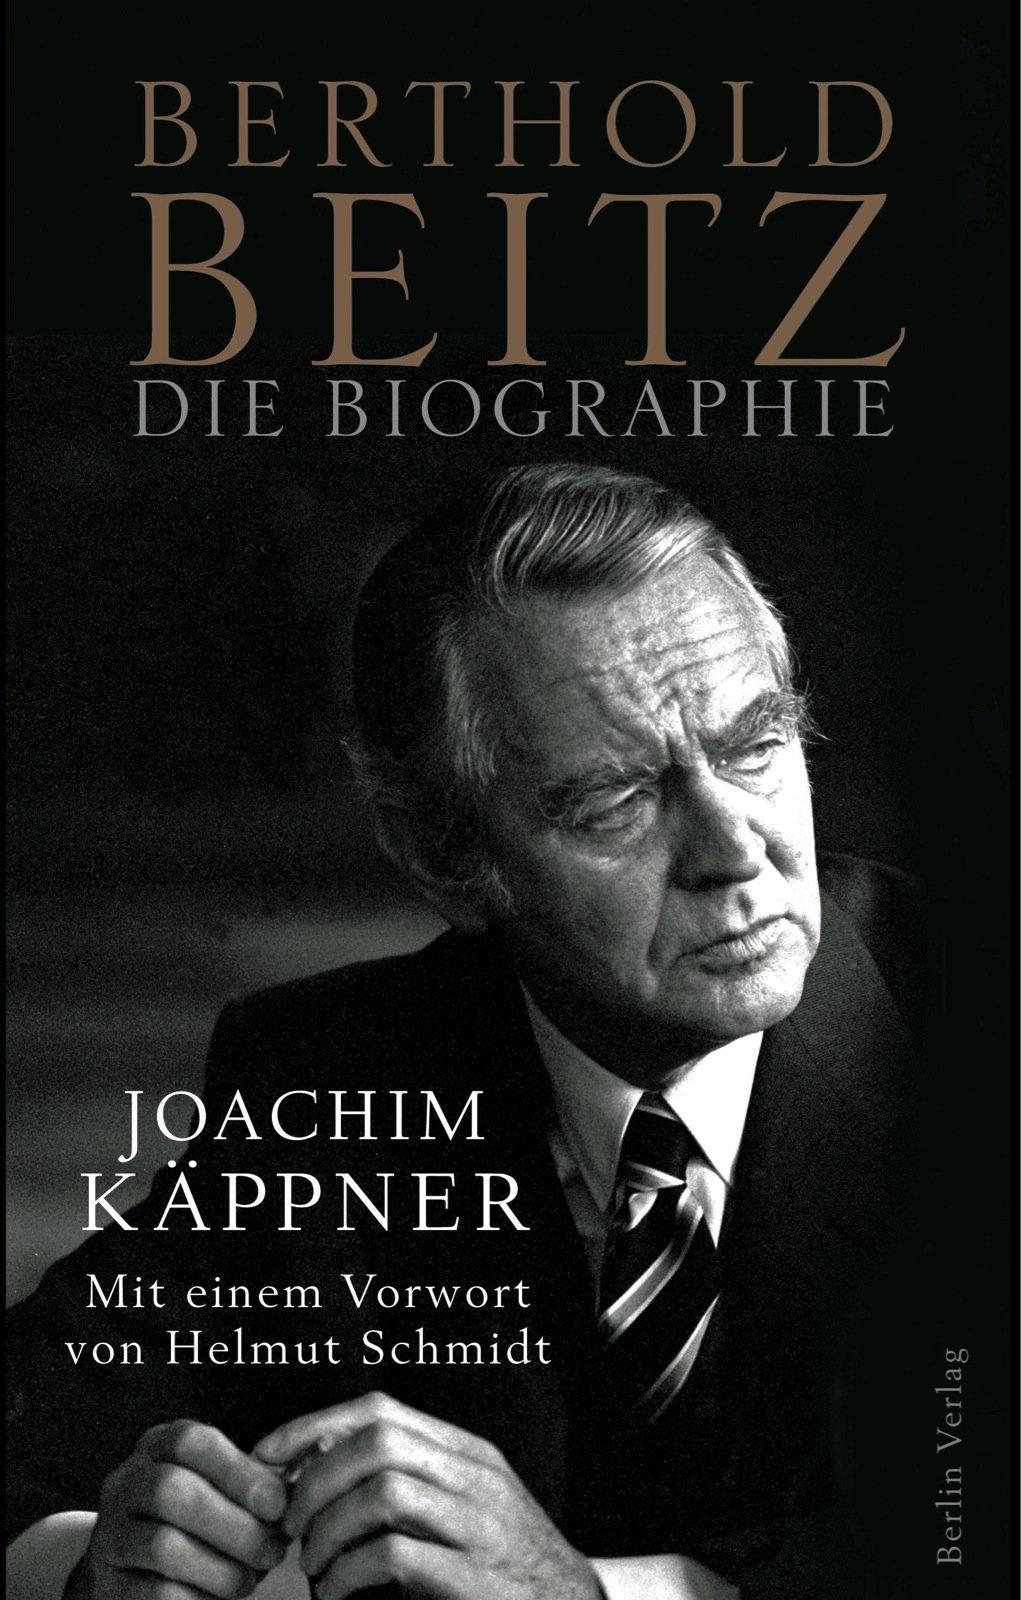 Joachim Käppner. Berthold Beitz. Die Biographie